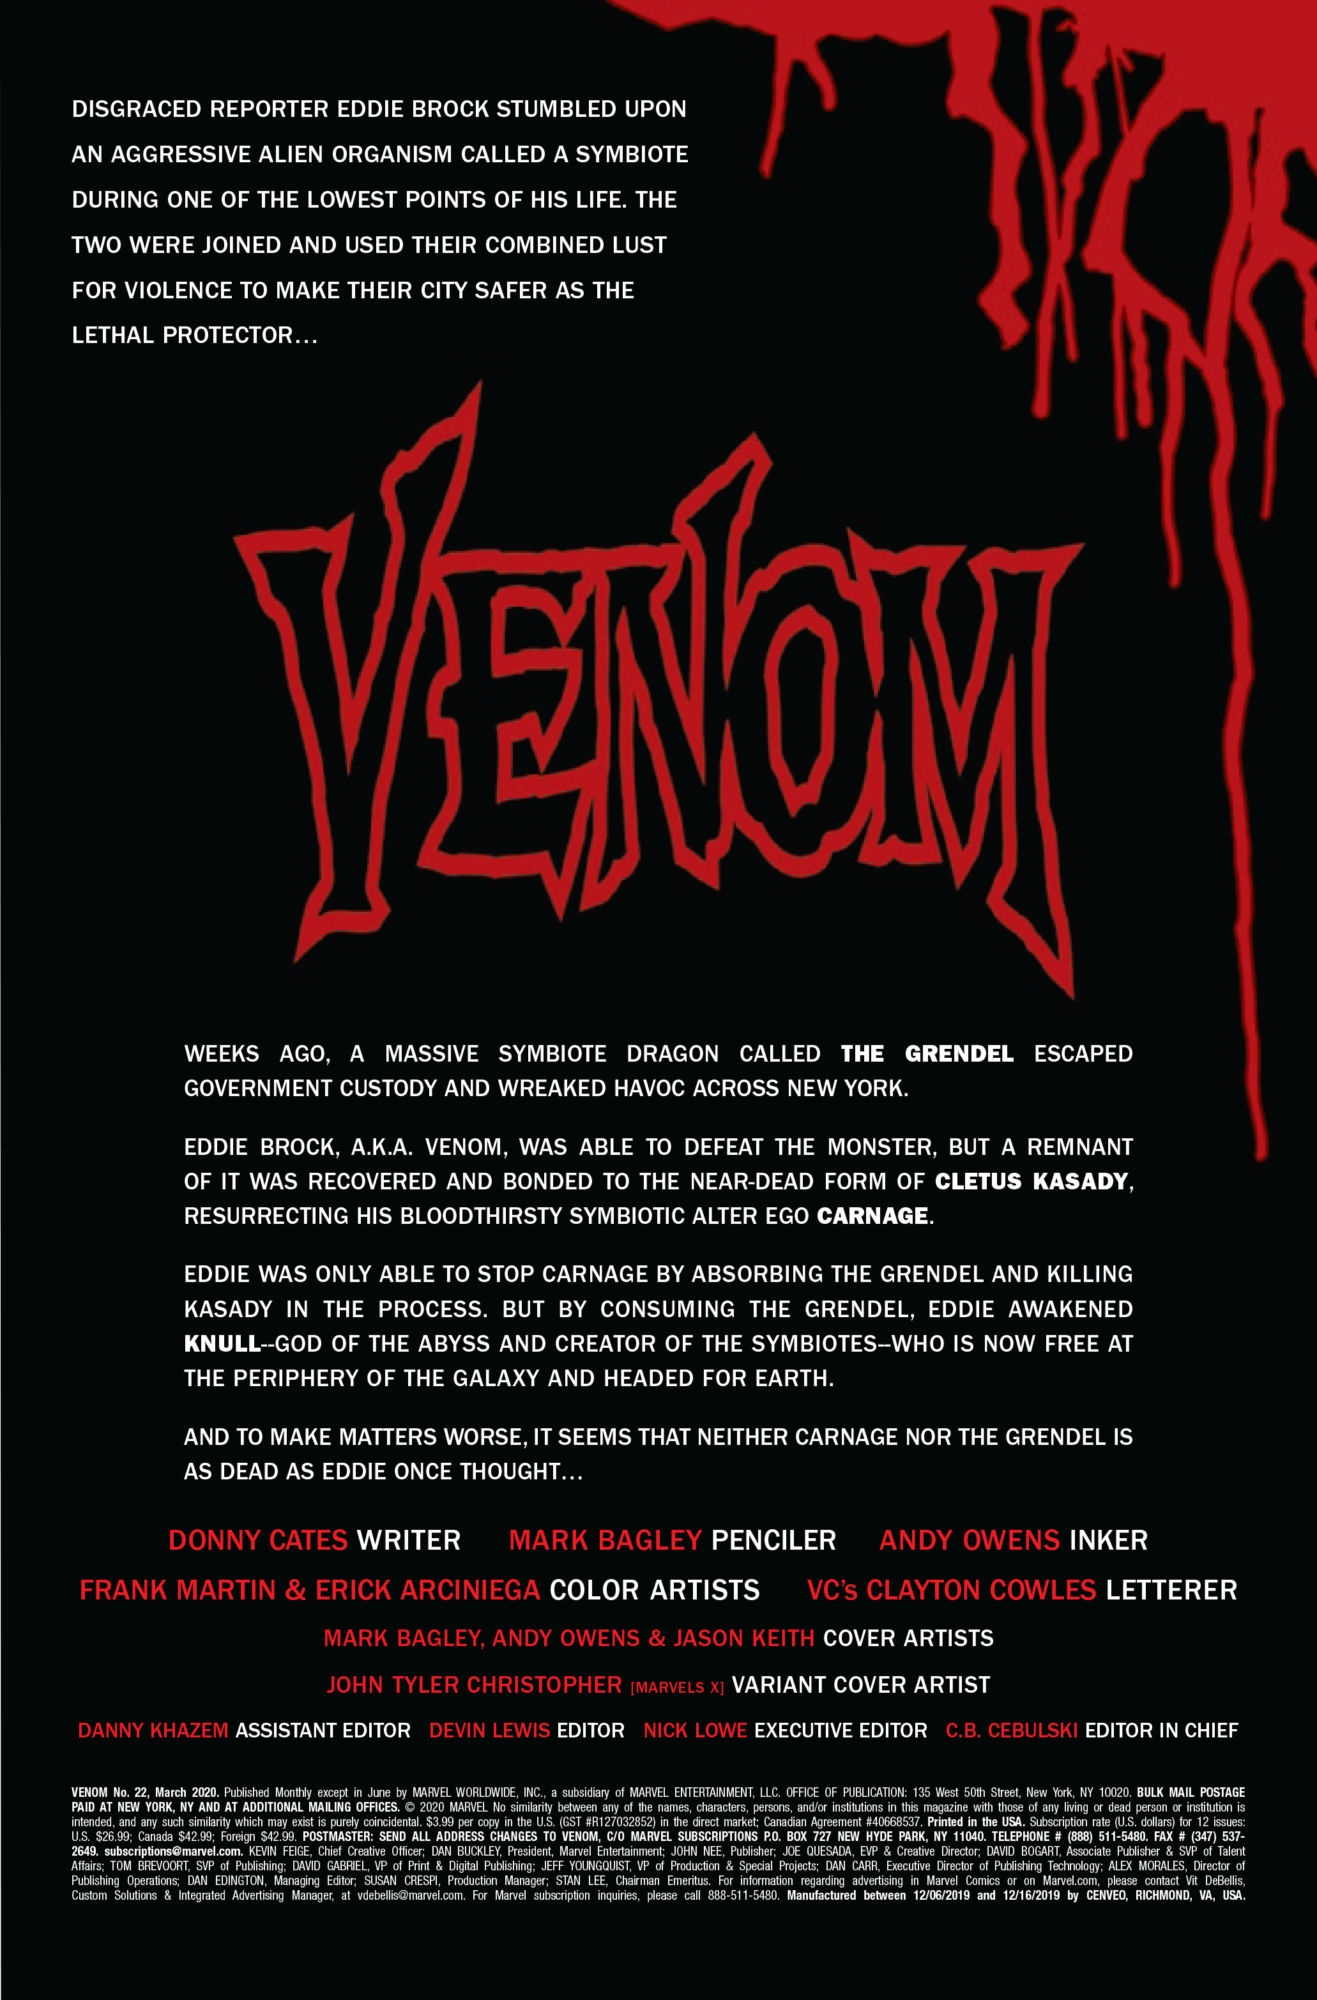 Eddie Brock is in His Underwear for This Entire Venom #22 Preview